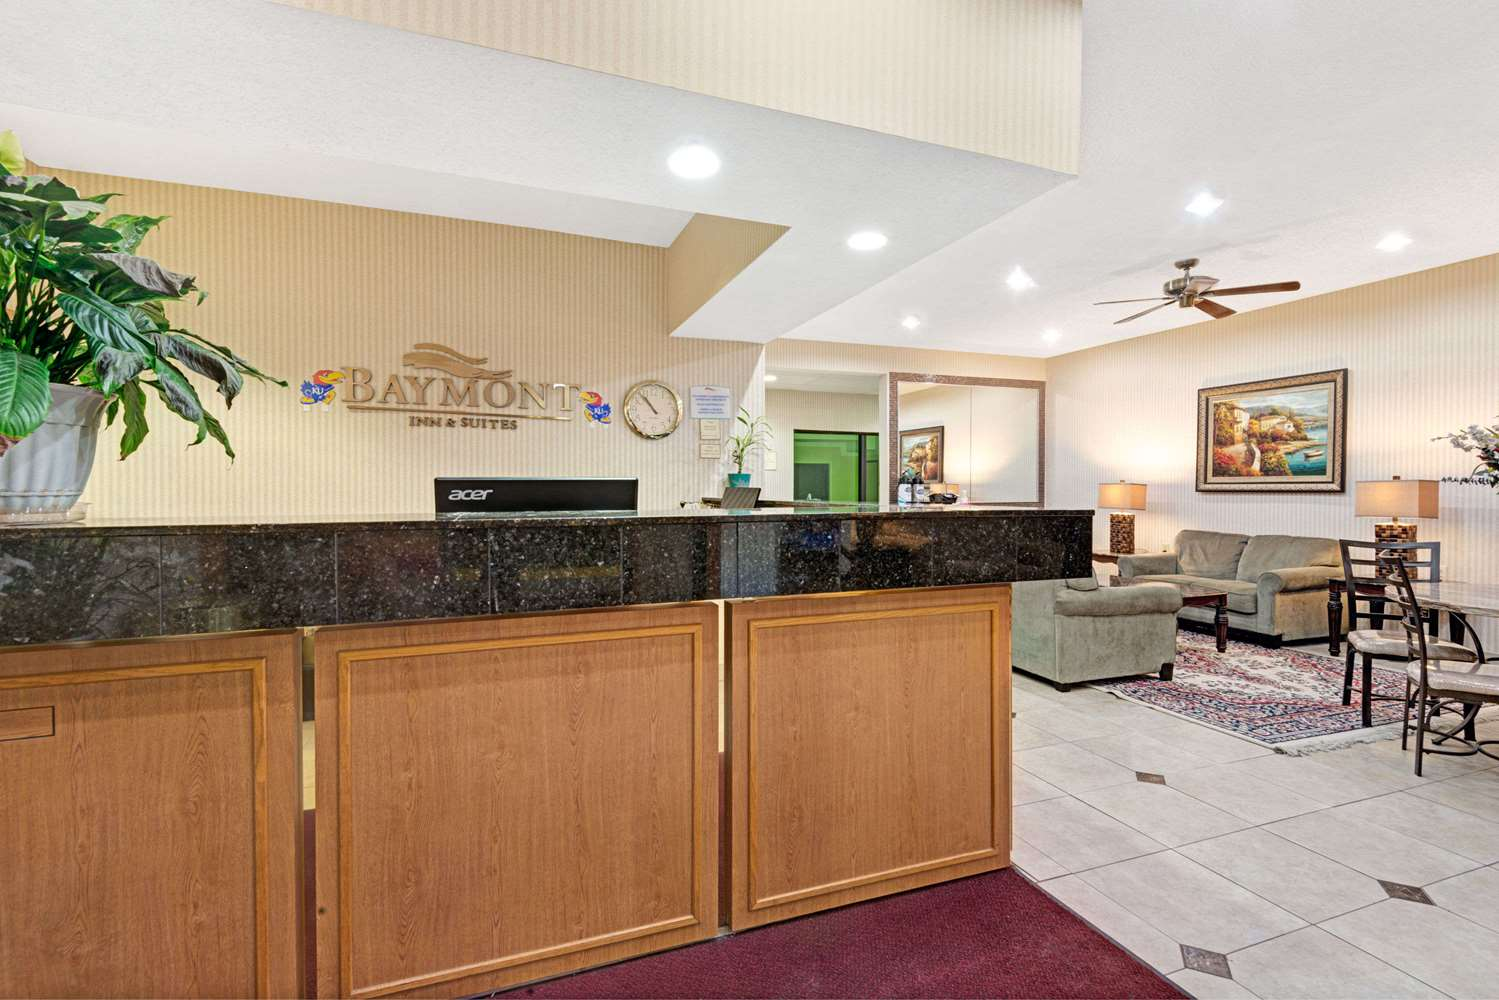 Lobby - Baymont Inn & Suites Lawrence